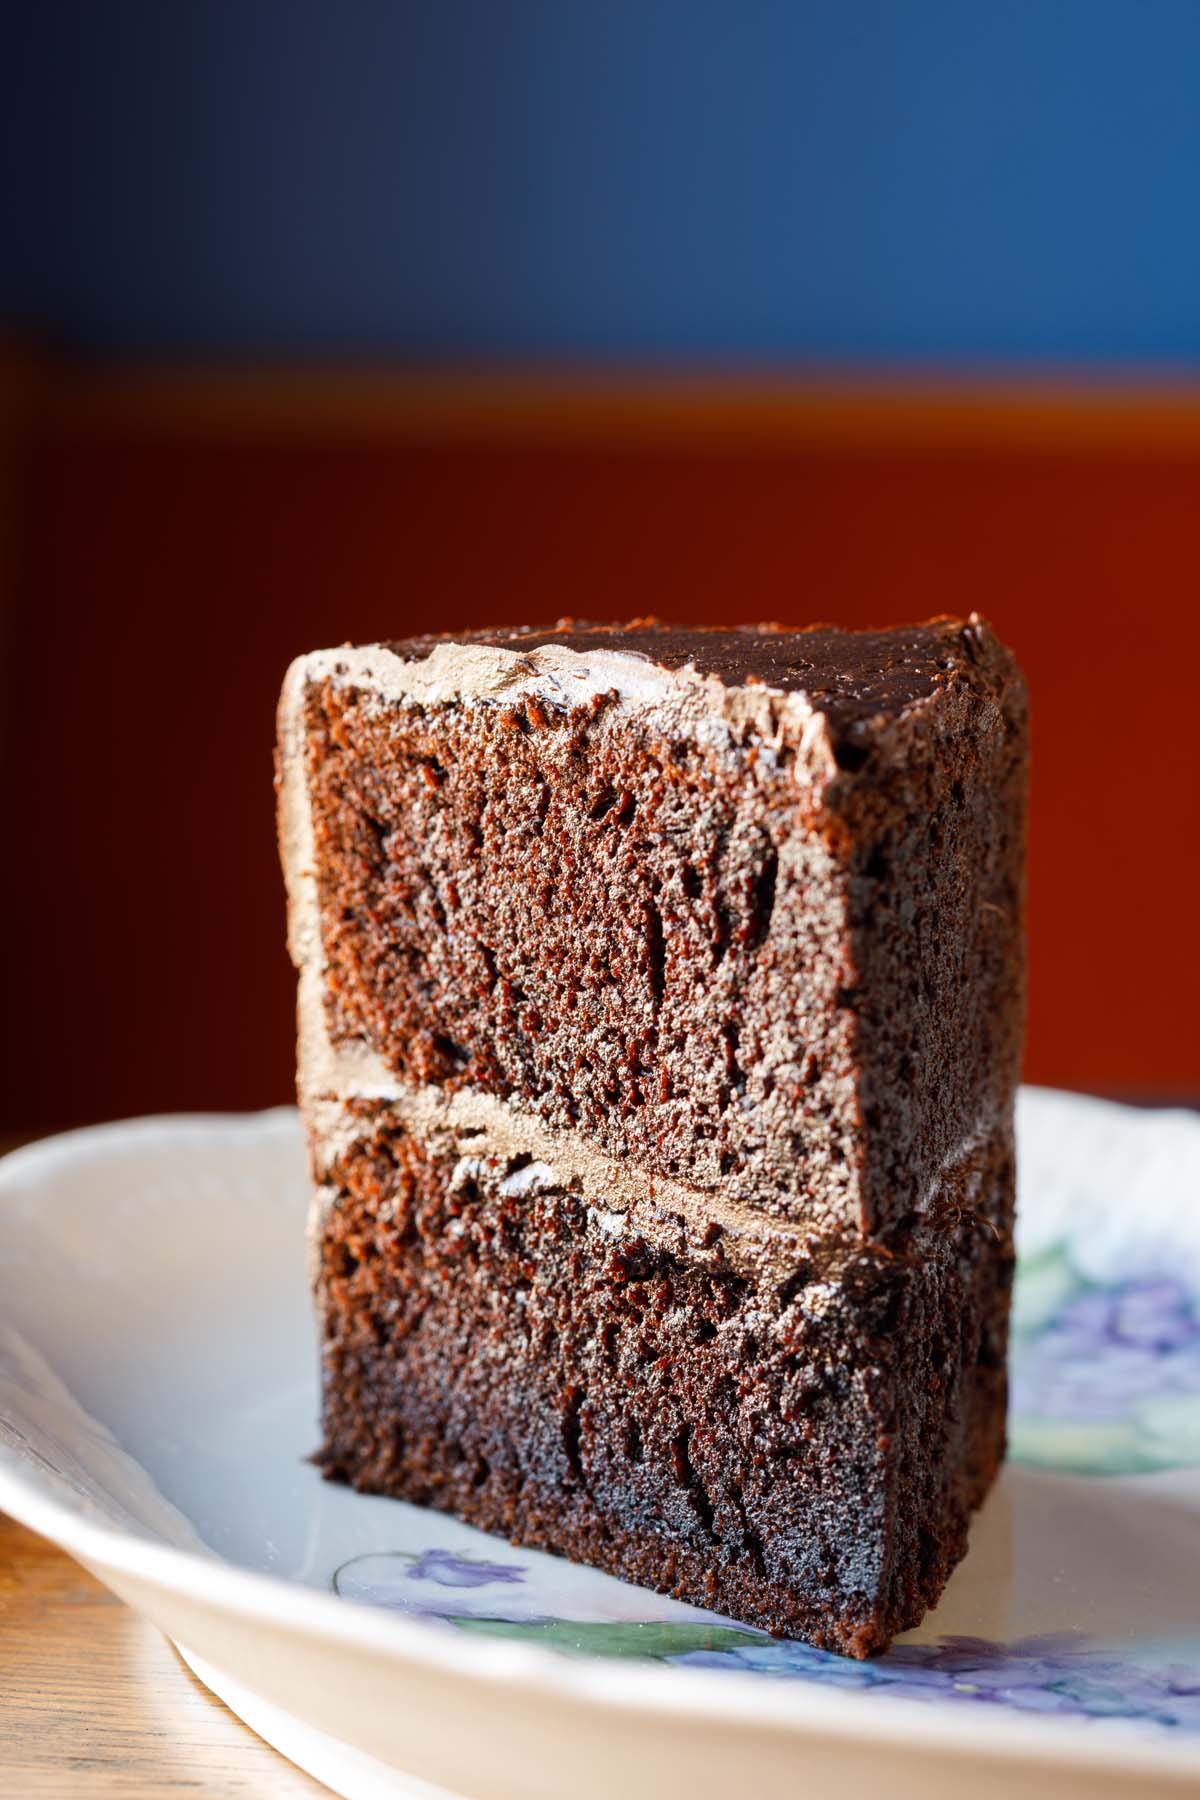 Best desserts in Wichita -Chocolate Cake